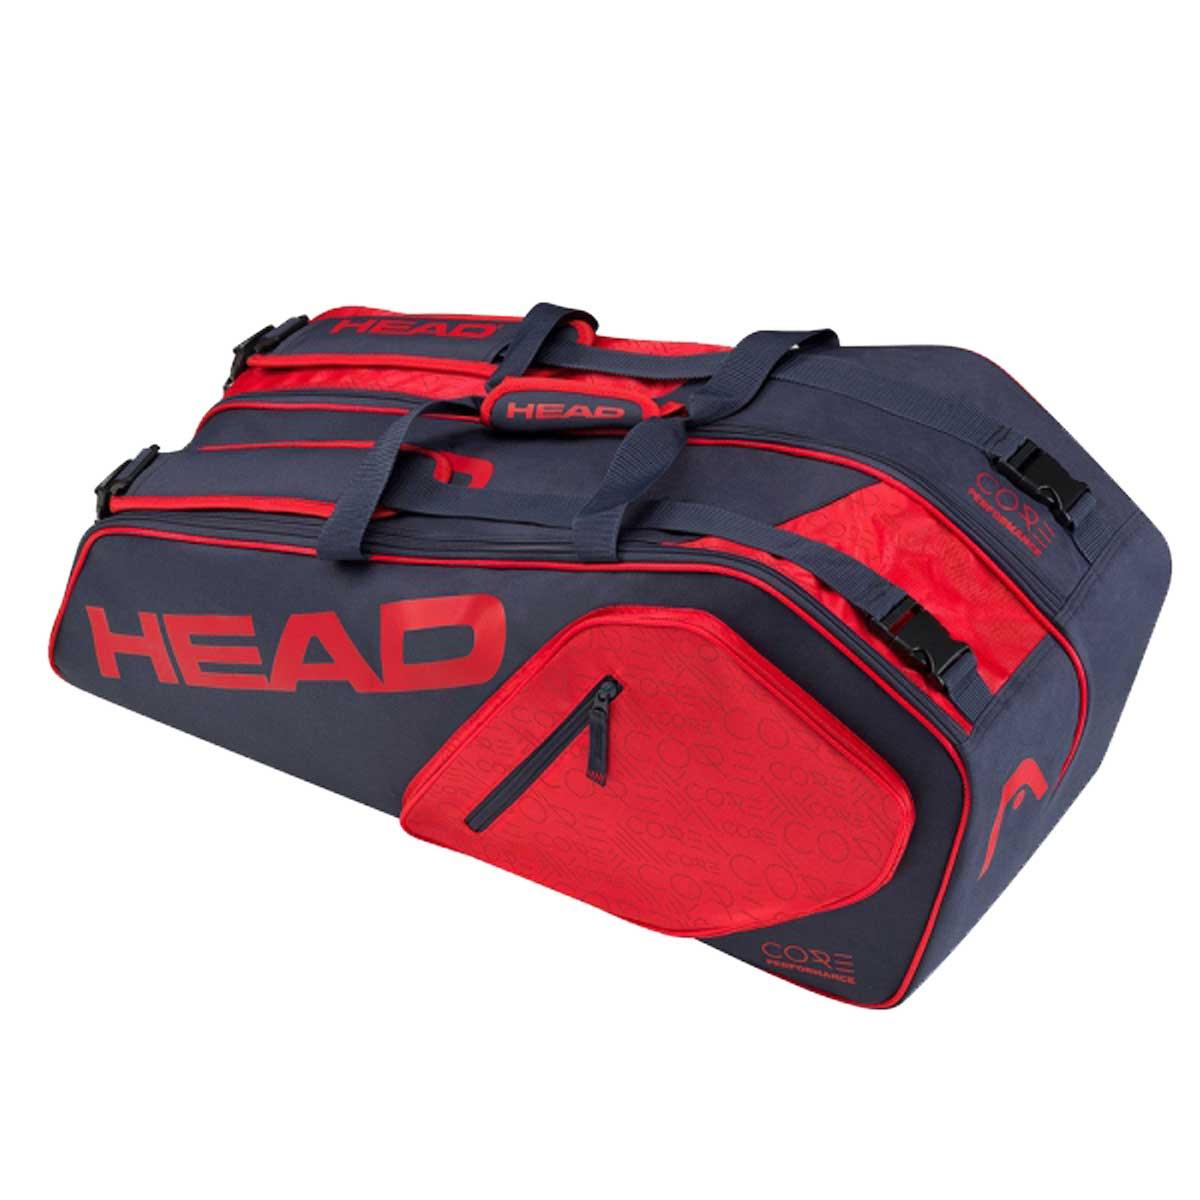 480a0a251cc7 Head Core Super Combi 9R Tennis Kit Bag (Navy Red)